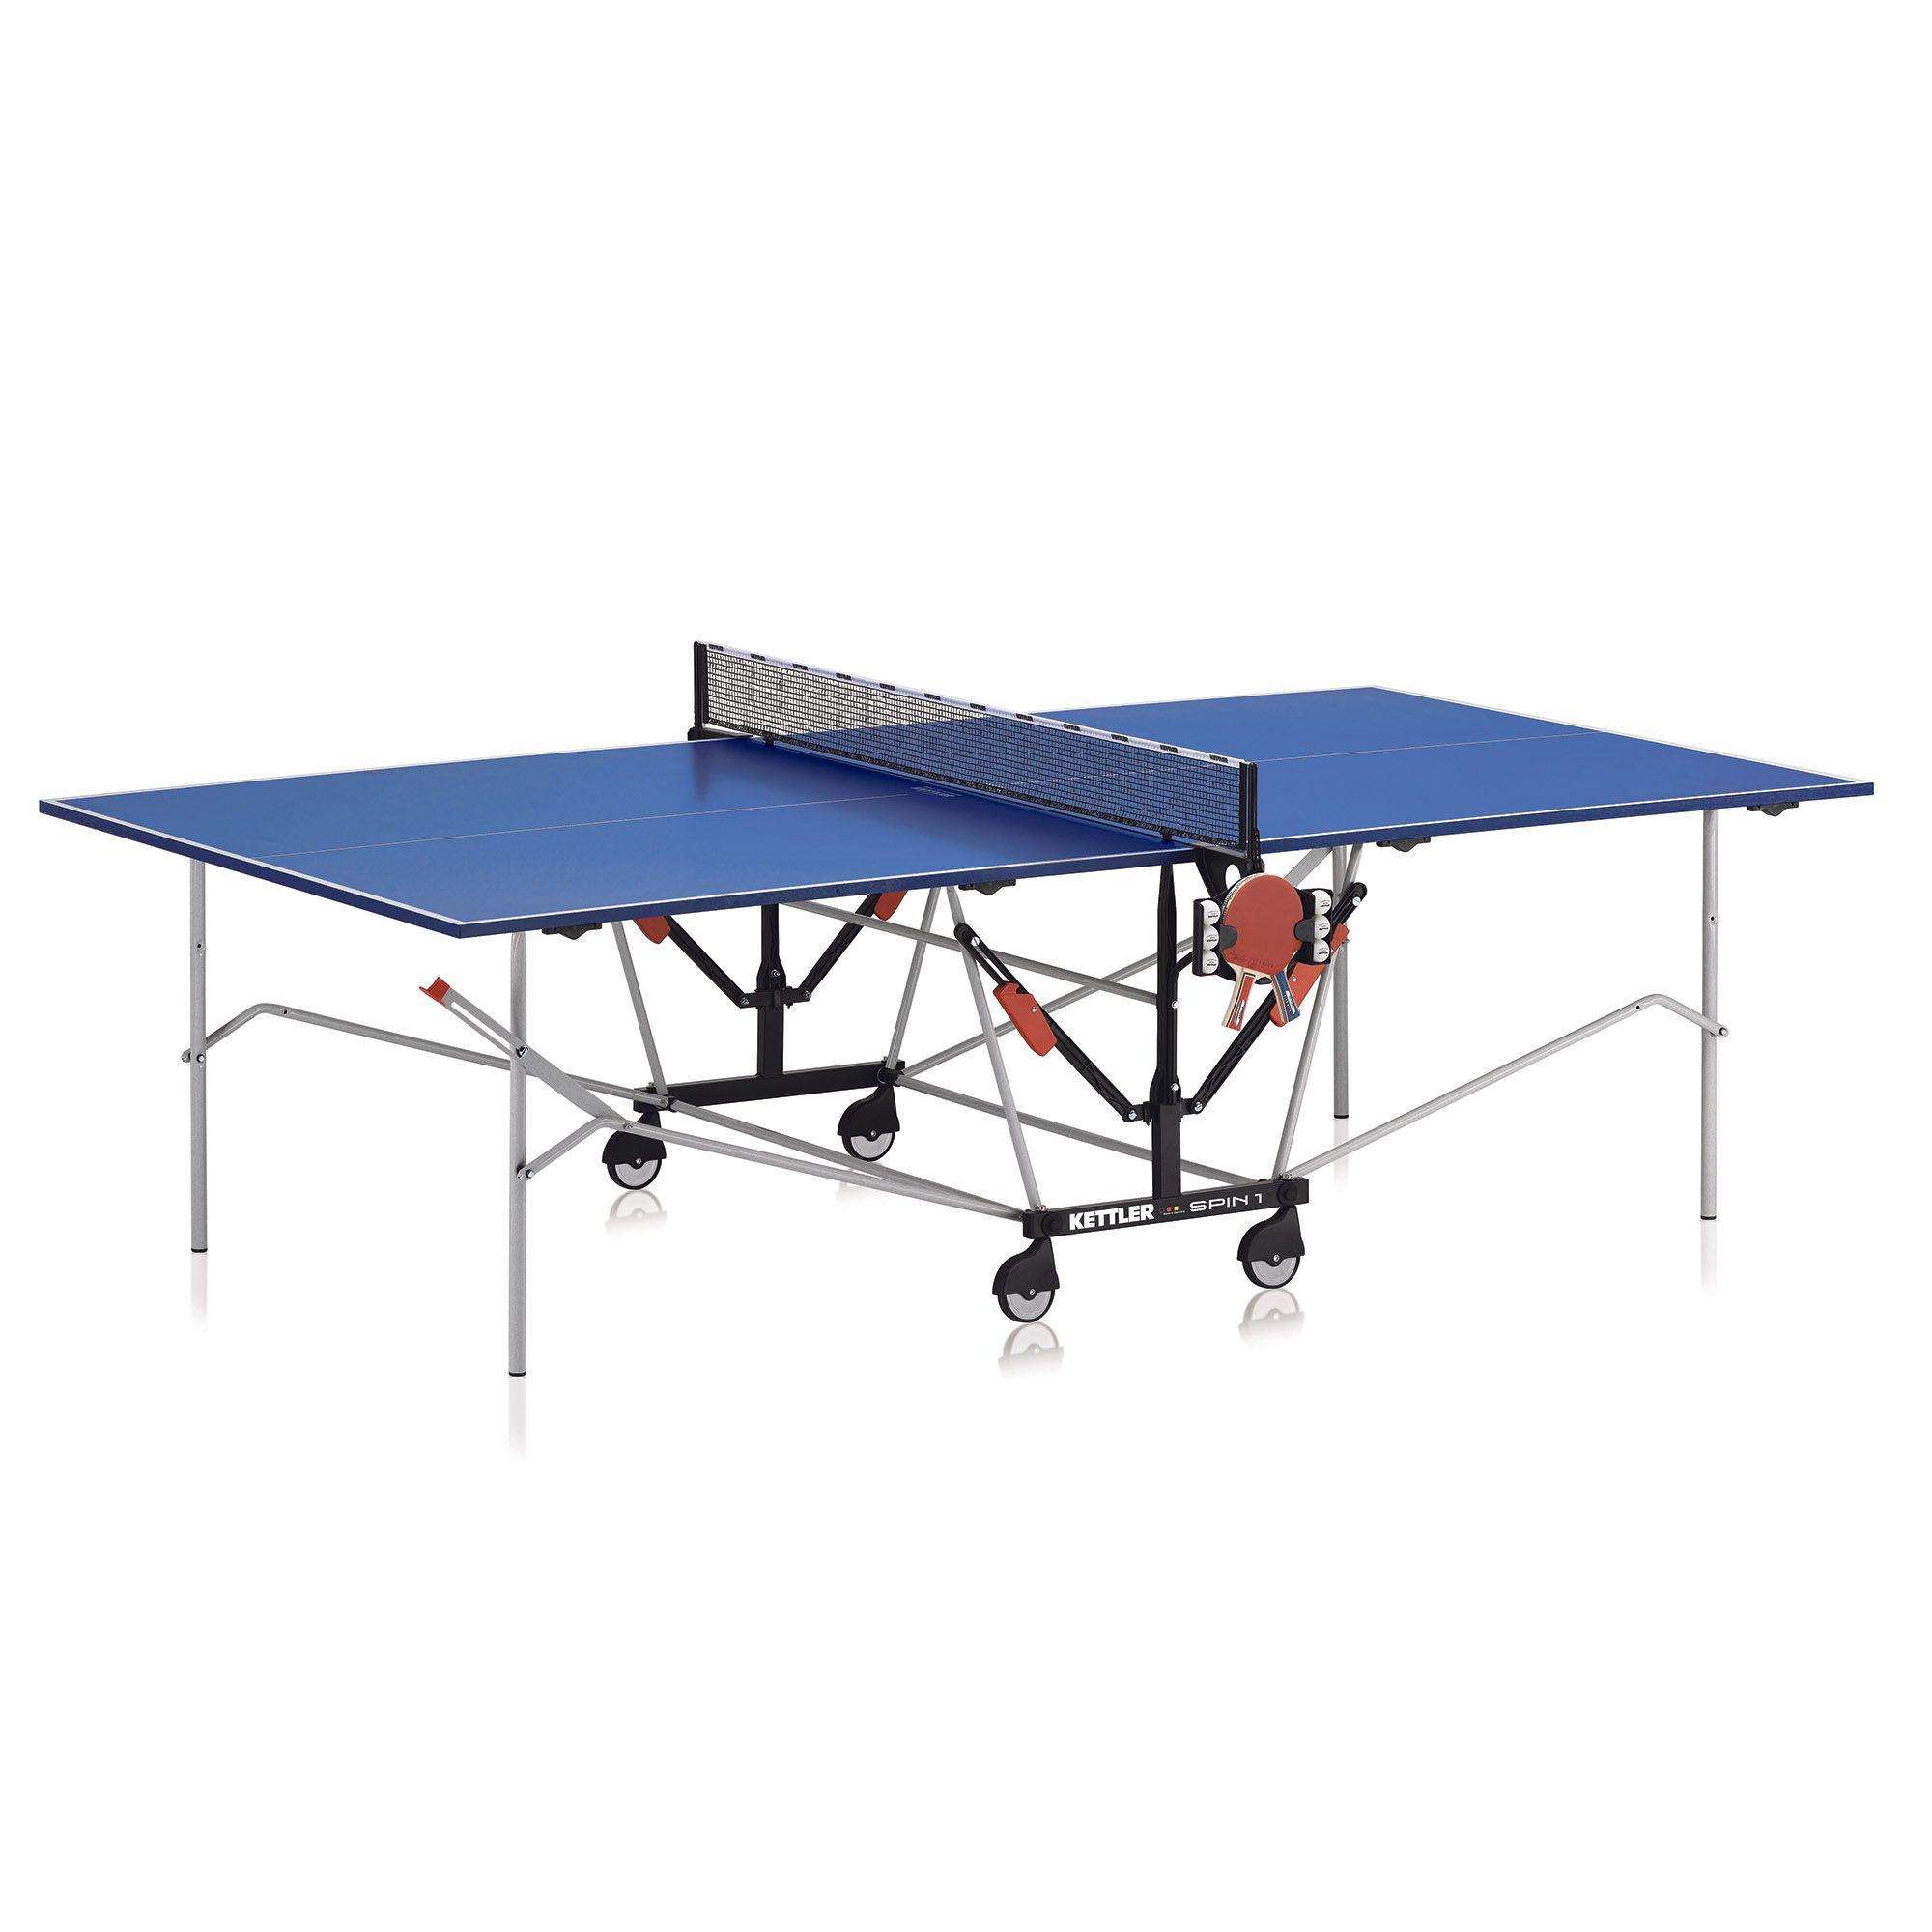 Kettler Spin 1 0 Indoor Table Tennis Table Sweatband Com